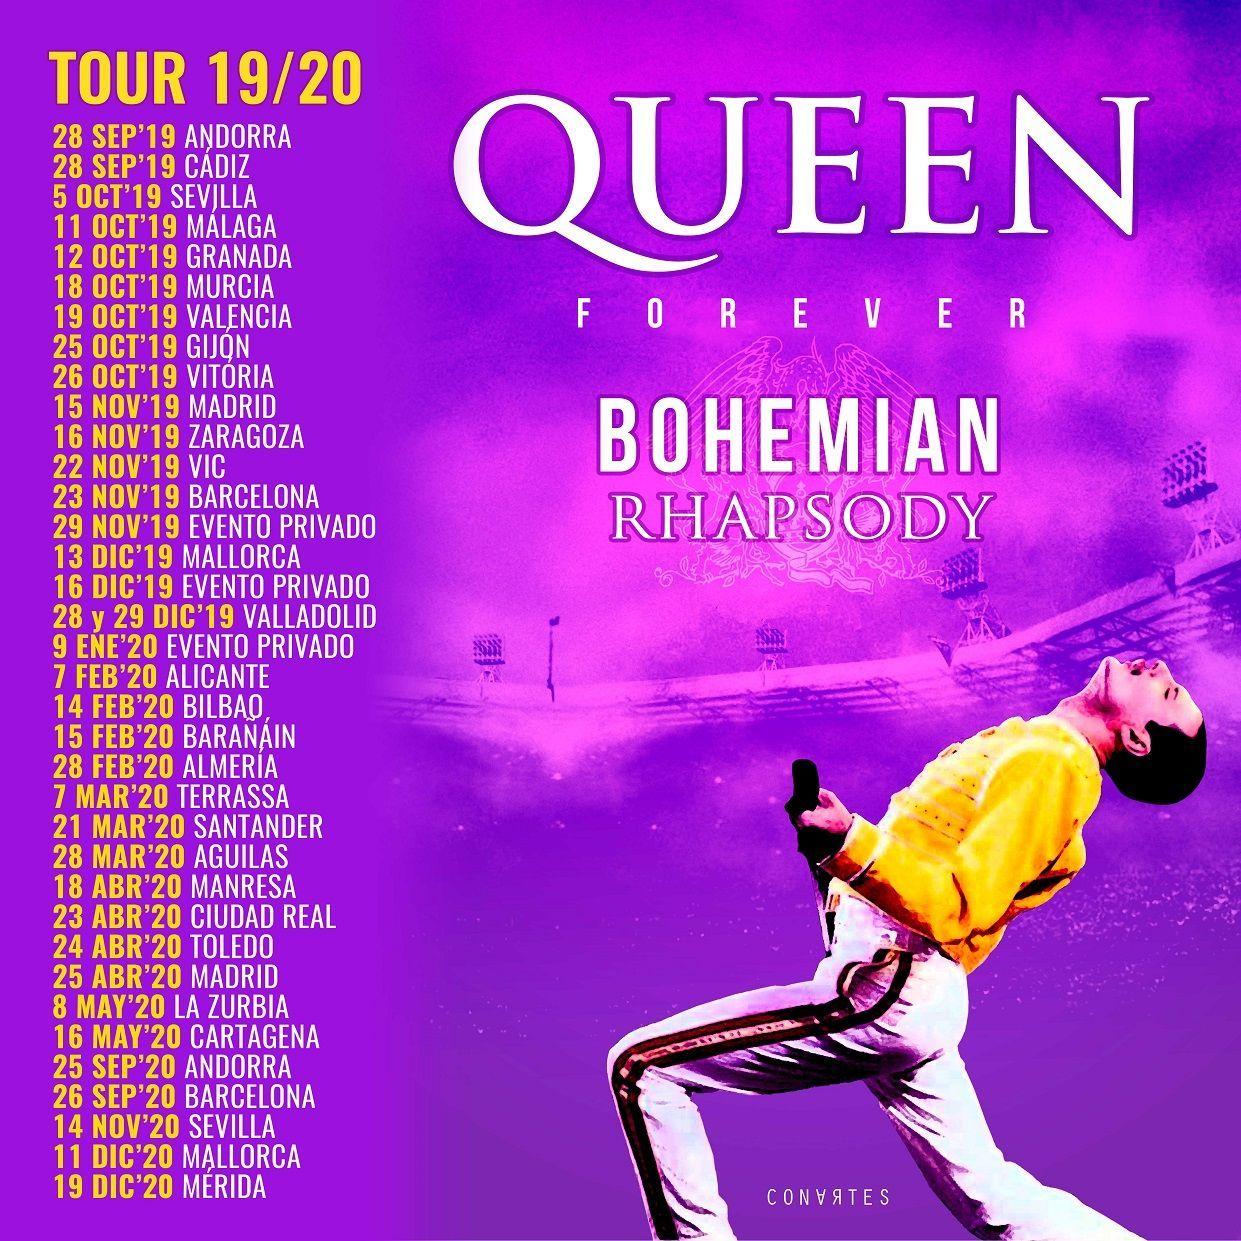 Queen Forever Gira